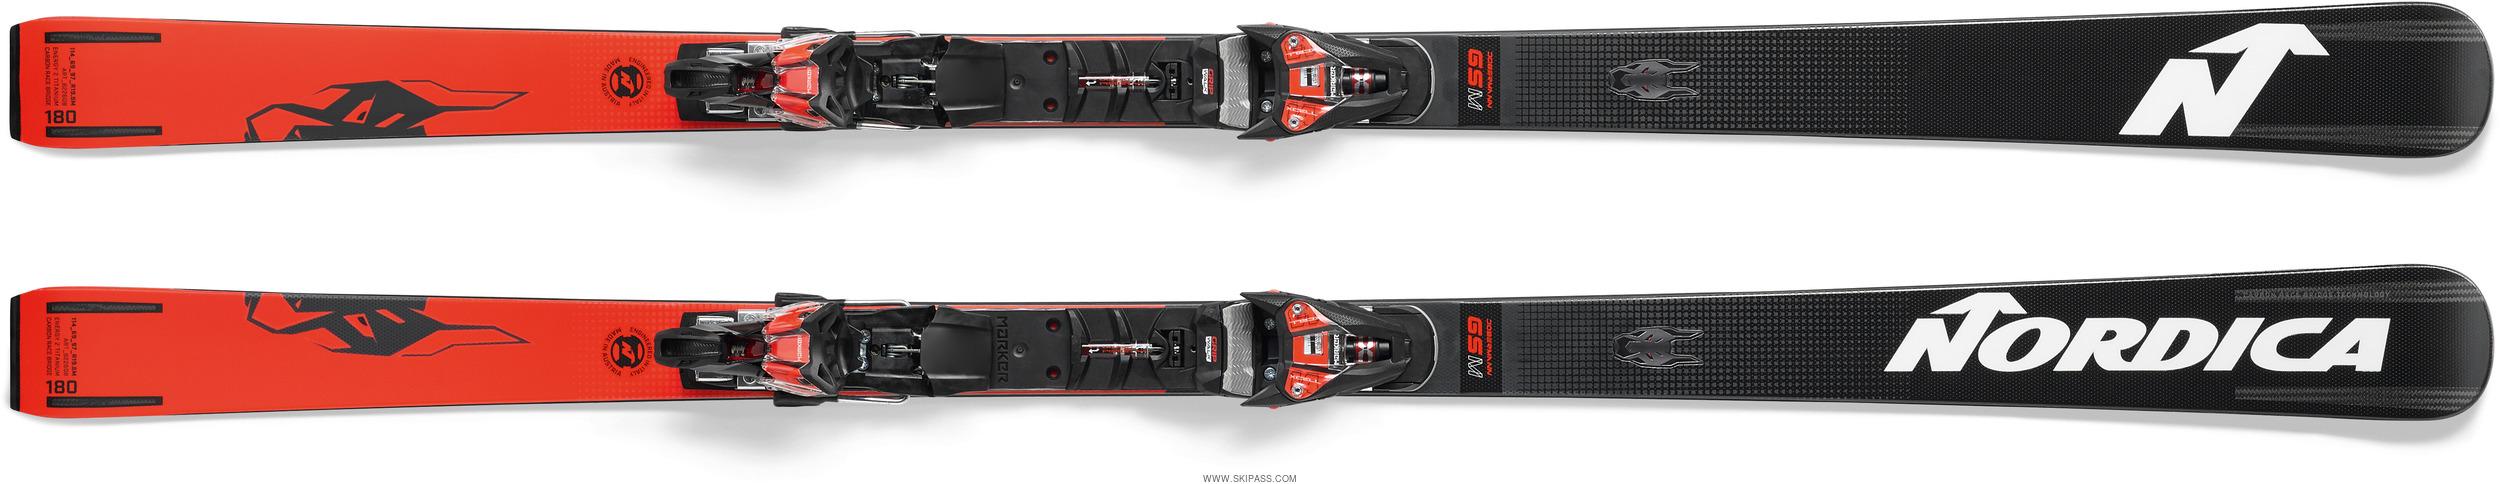 Nordica Dobermann GSM RB Piston